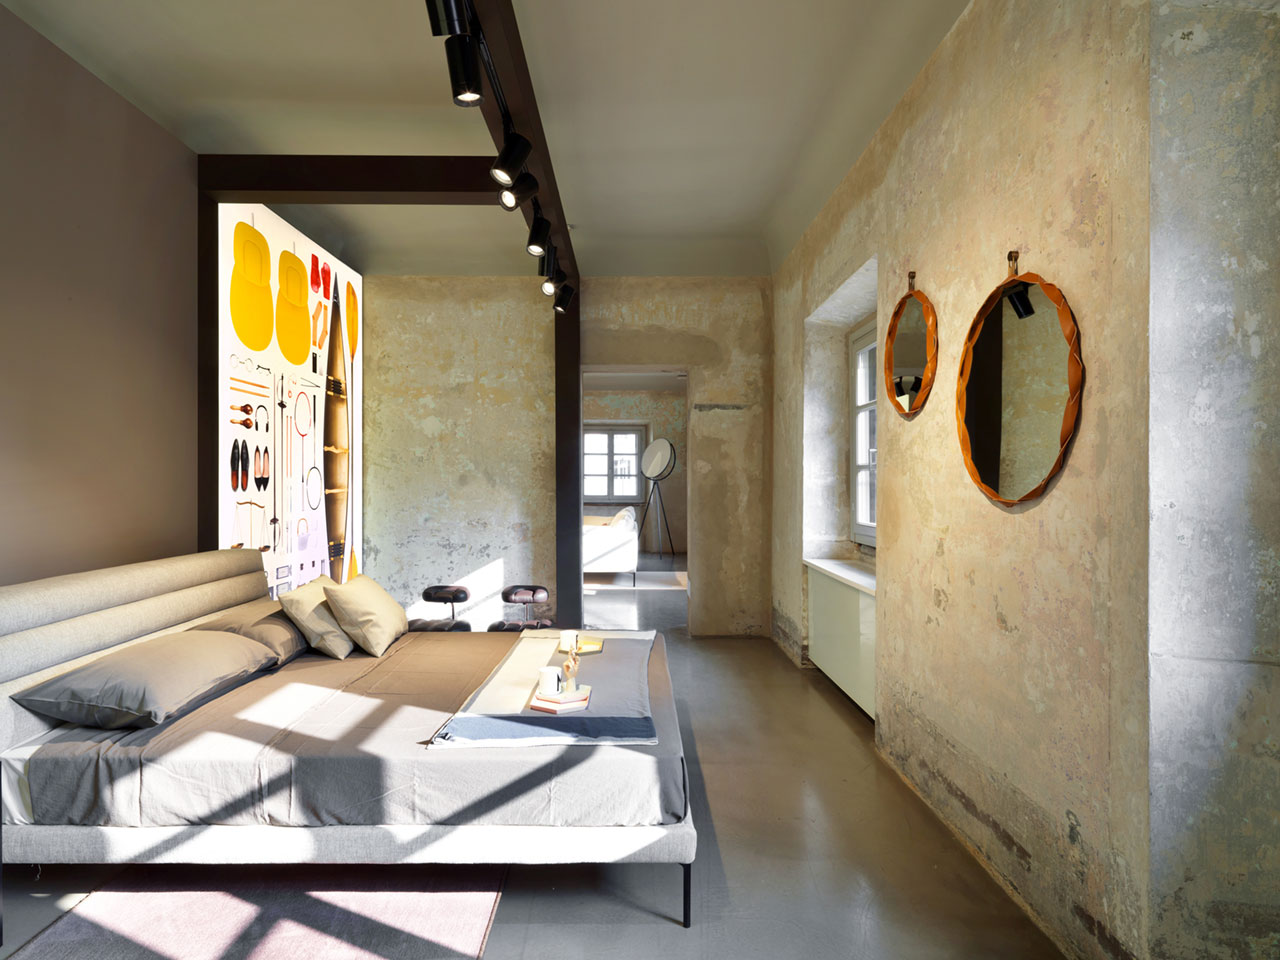 'Zanotta:Stories', exhibition in Milan, 2017-2018, inpartnership withTecno.Exhibition designbyCalvi Brambilla. PhotoAndrea Martiradonna. Courtesy of Zanotta.